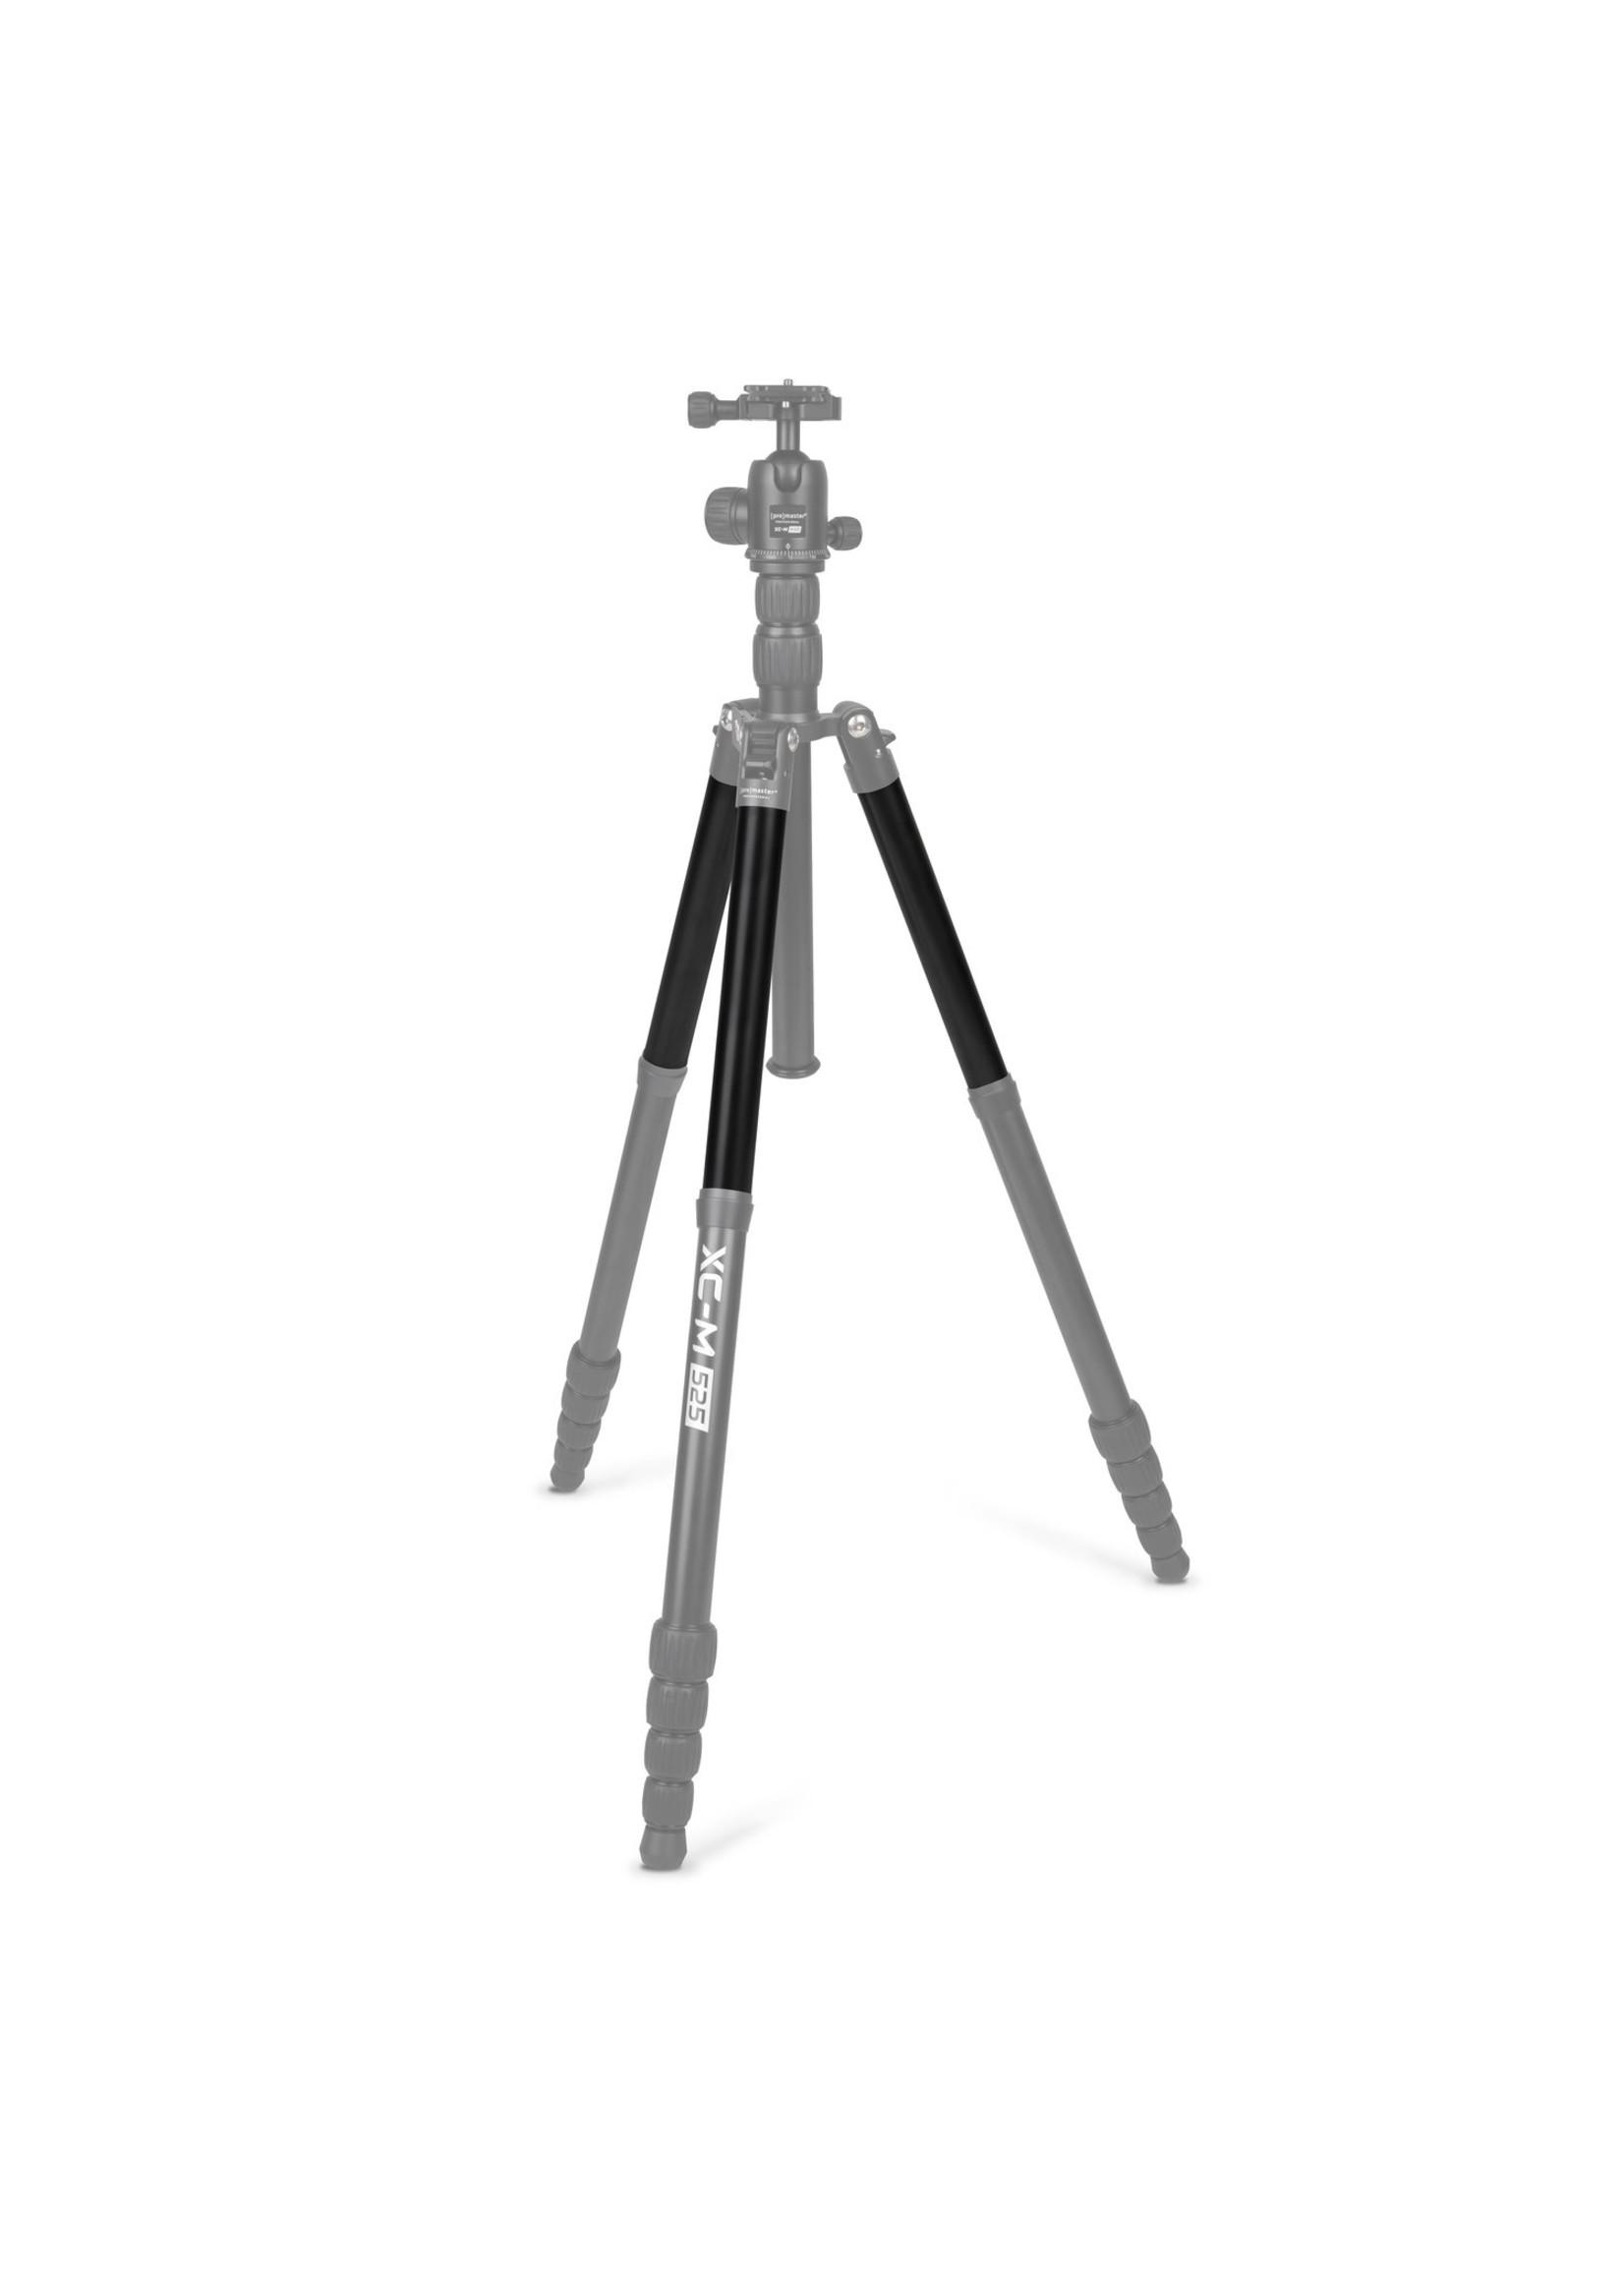 ProMaster ProMaster XC-M Ext Leg Set of 3